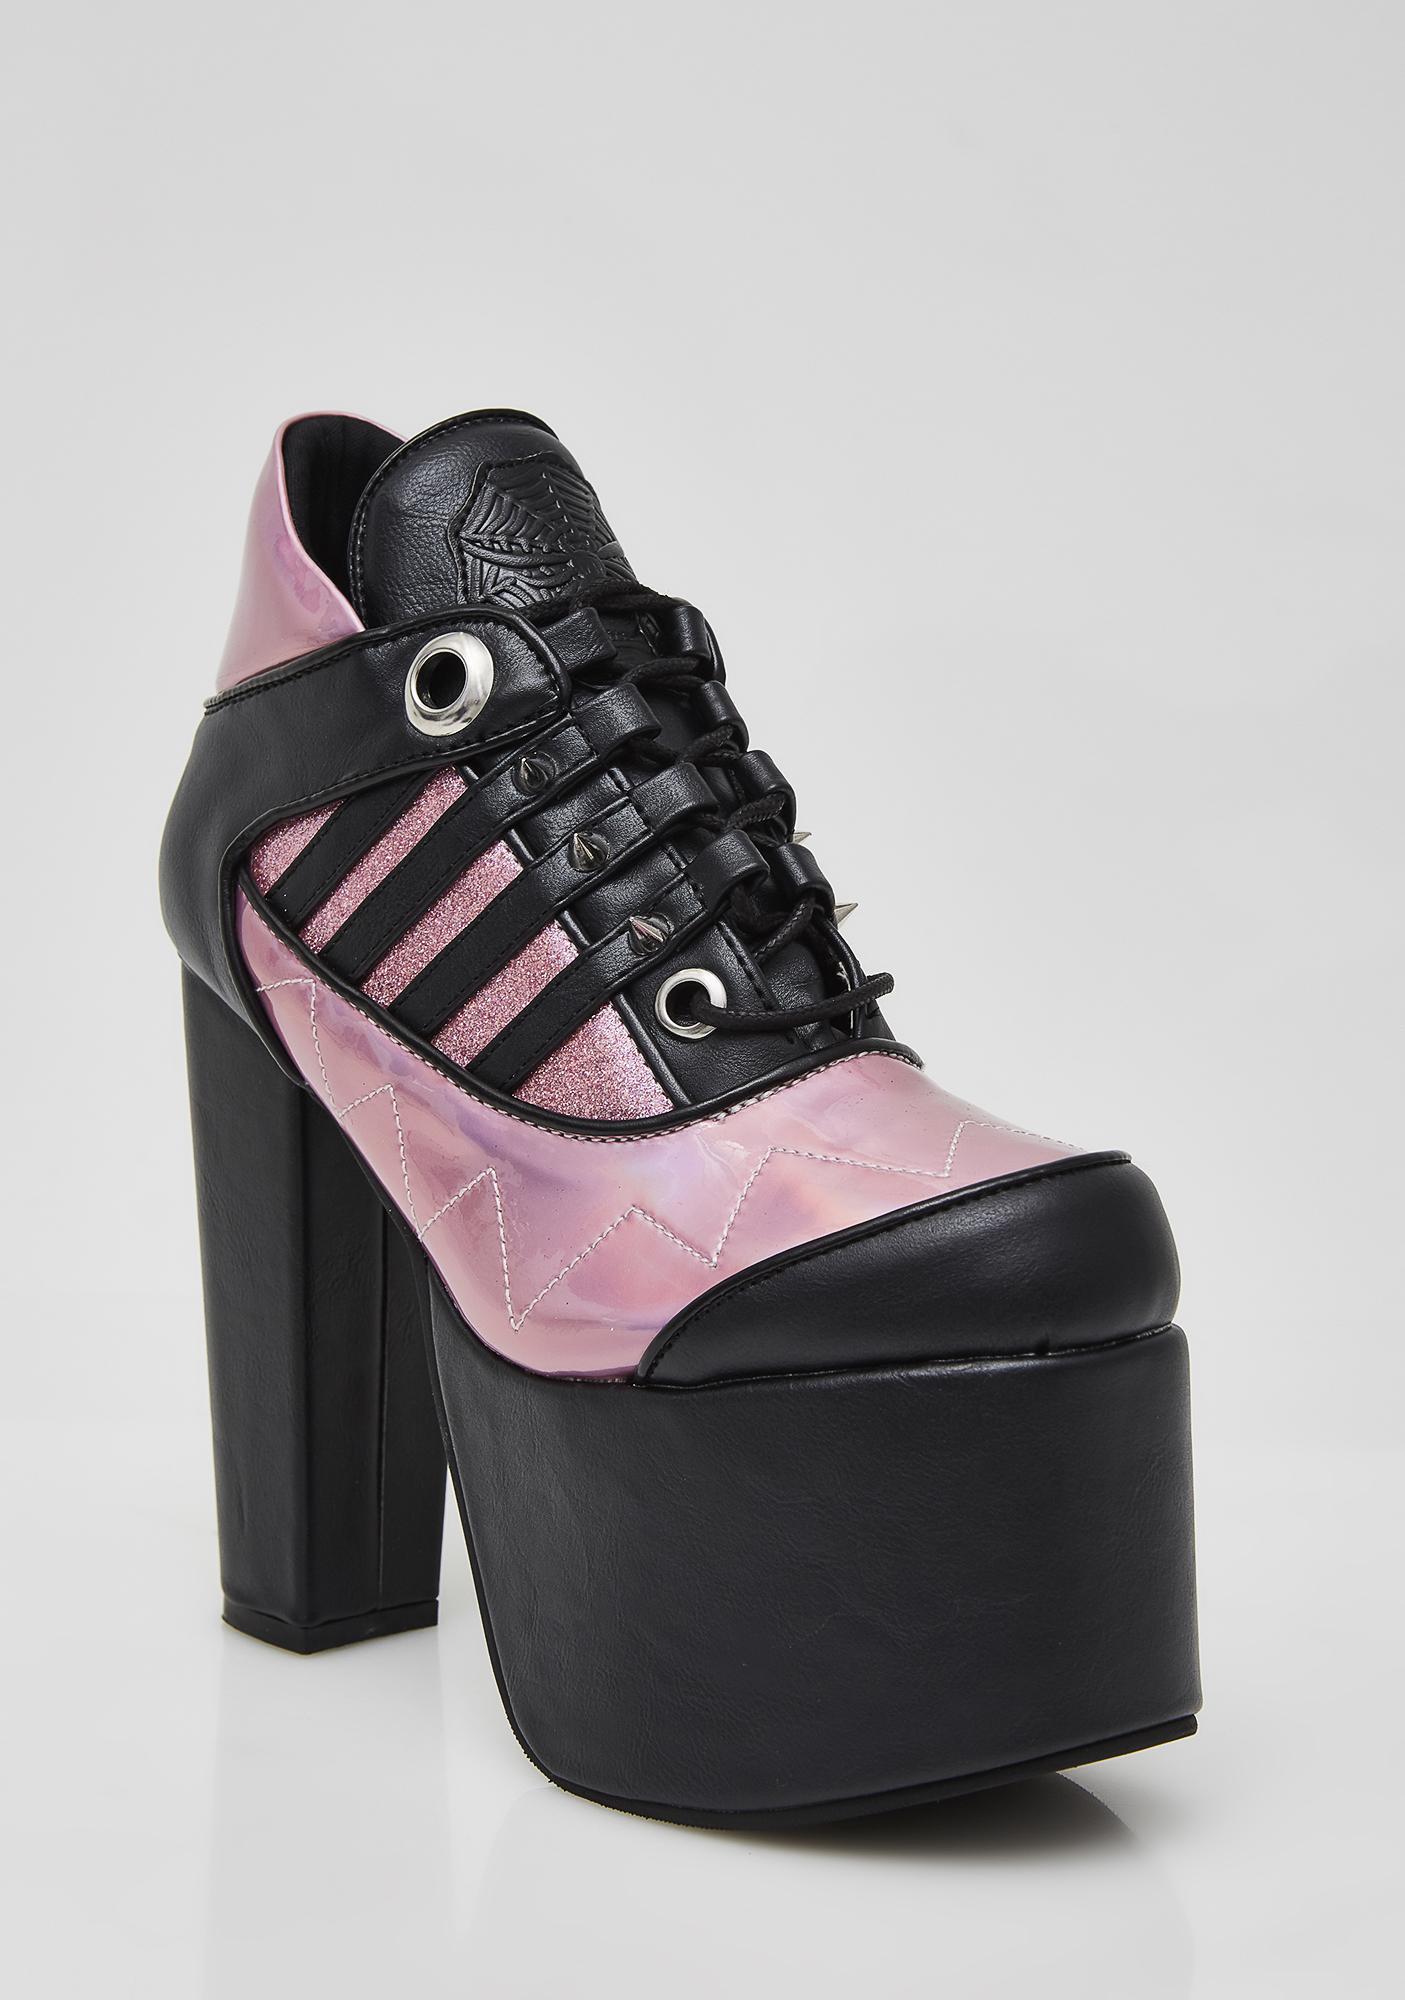 Demonia Tormented Platform Heels